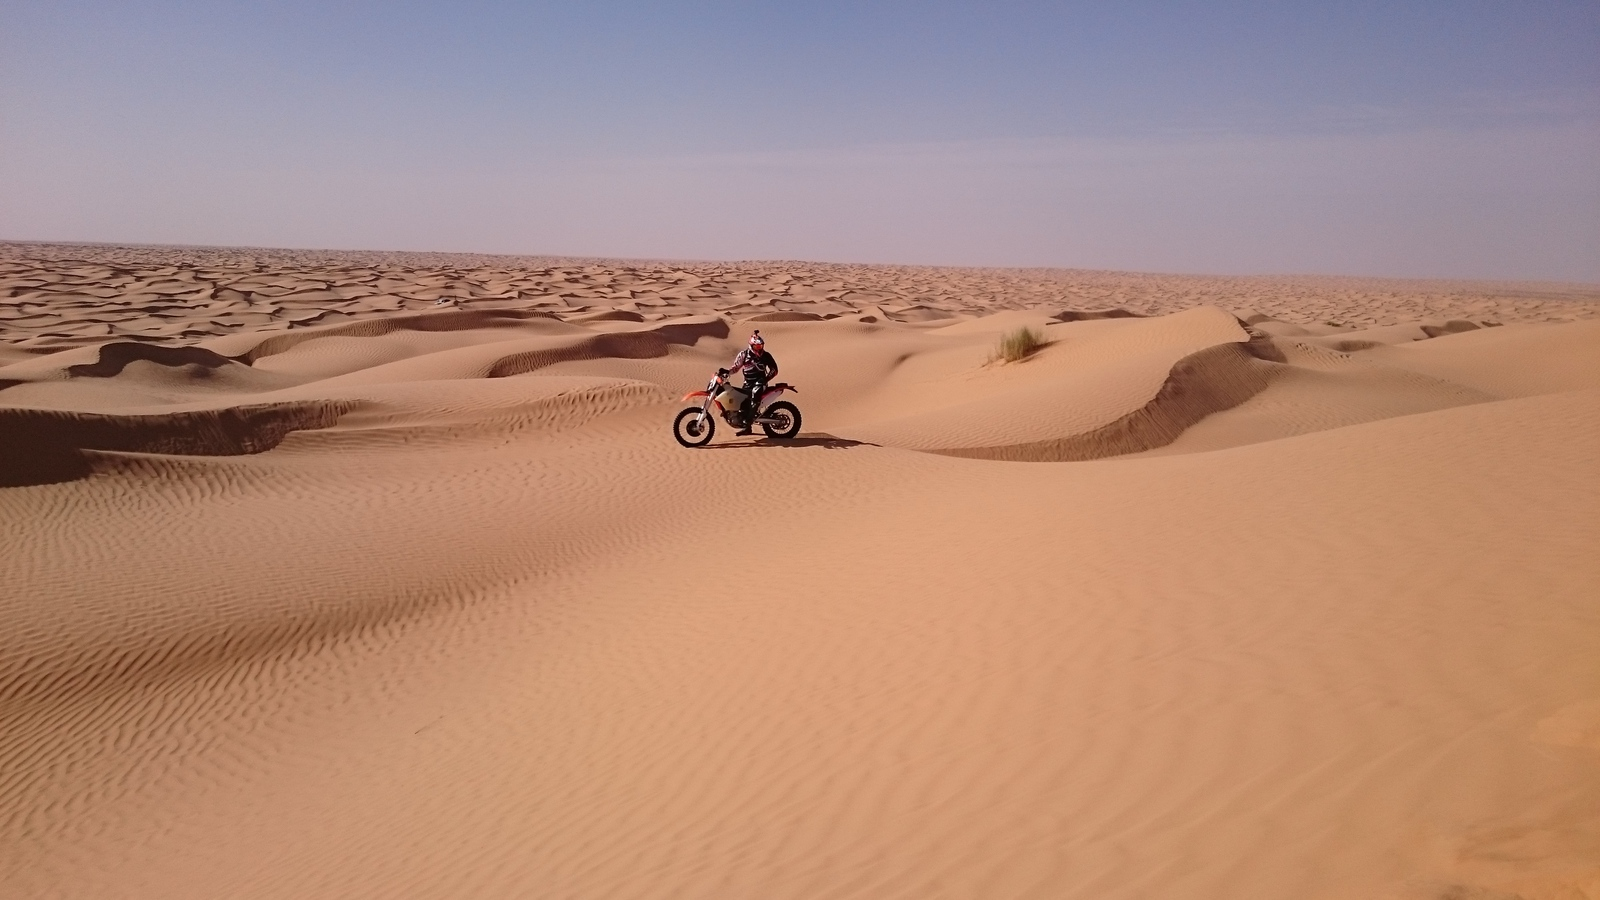 duny a duny